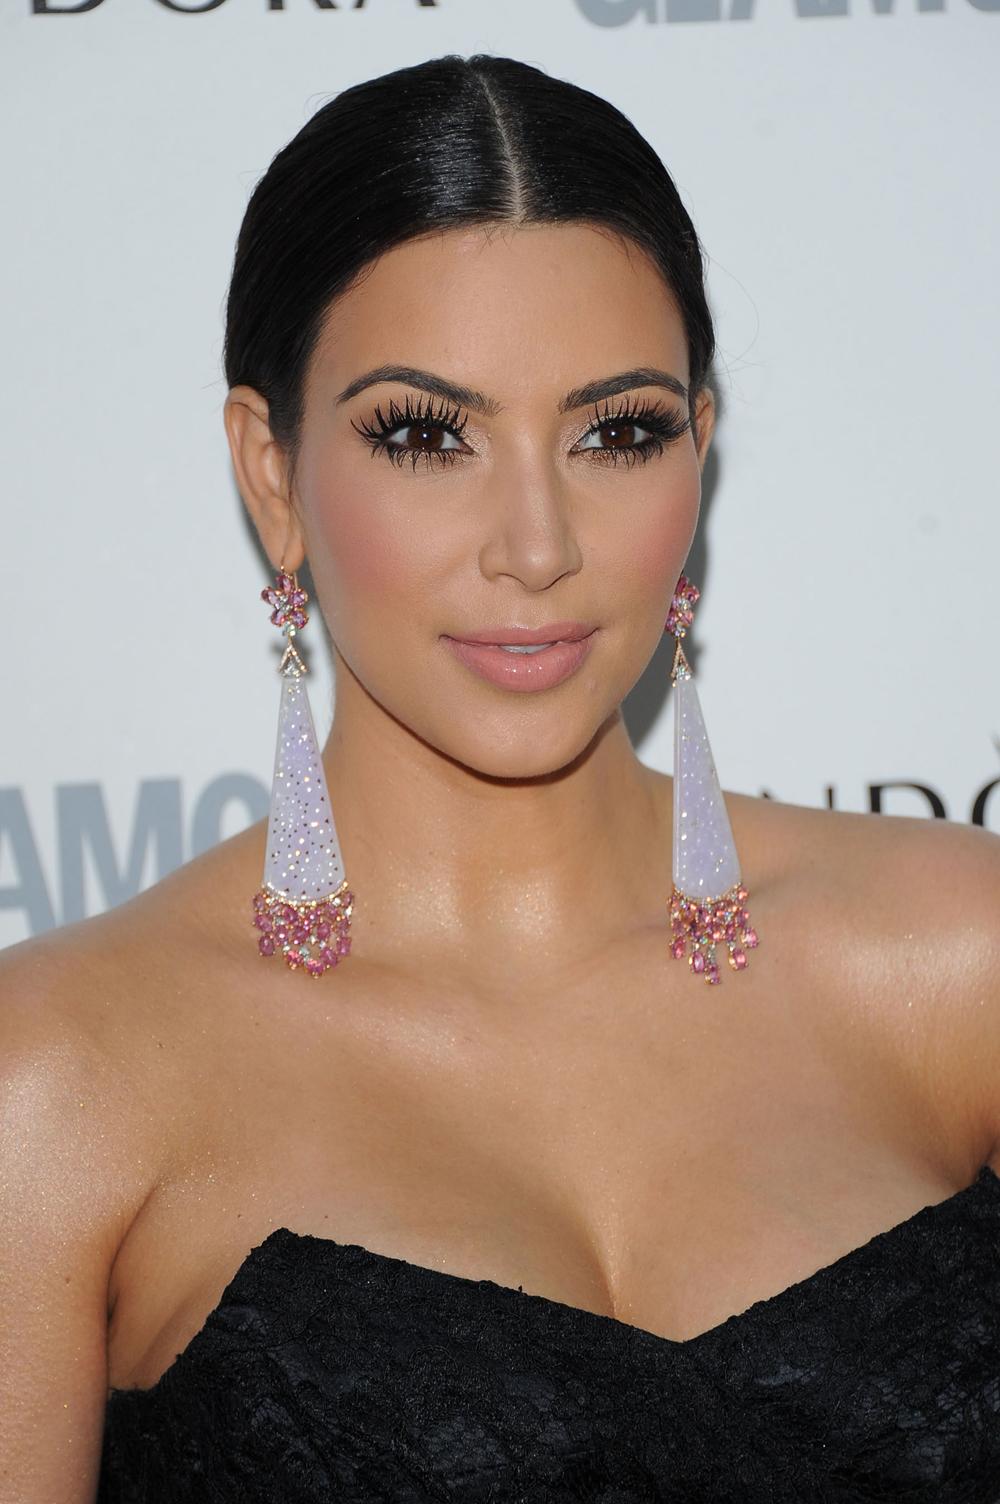 Kim Kardashian Black Ponytail Hairstyles 08